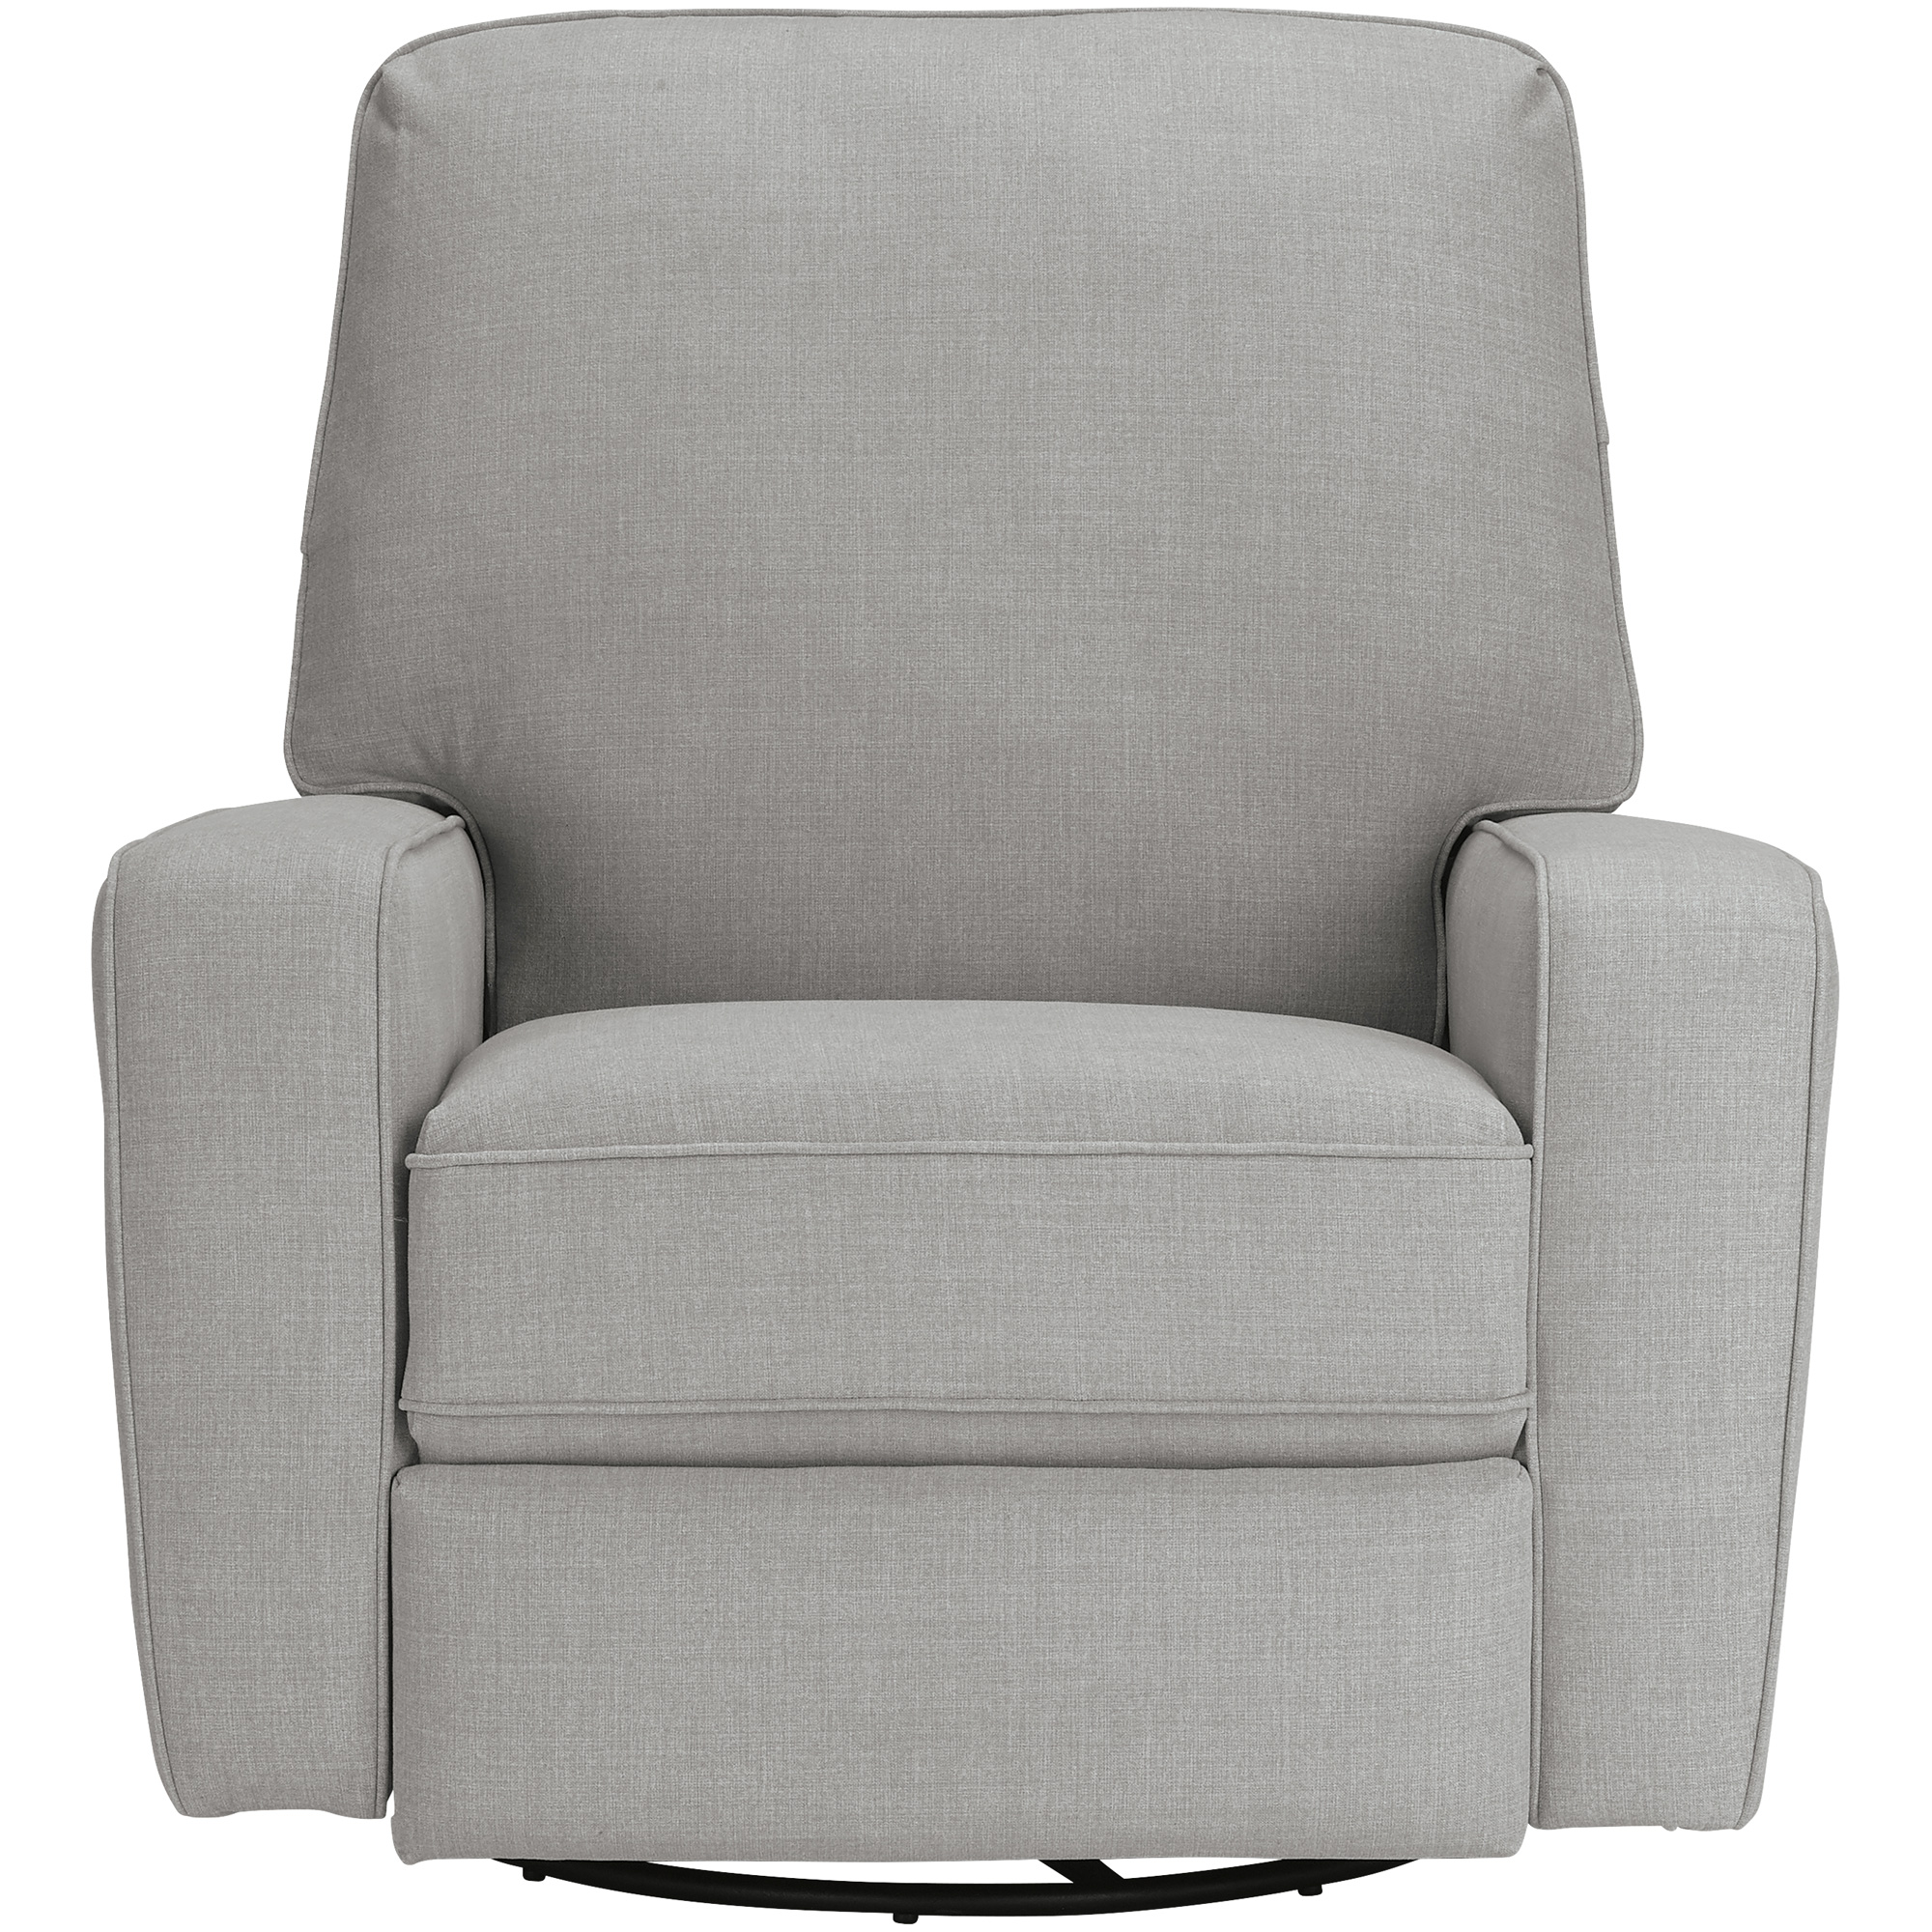 Best Home Furnishings | Bilana DoveGray Swivel Glide Recliner Chair